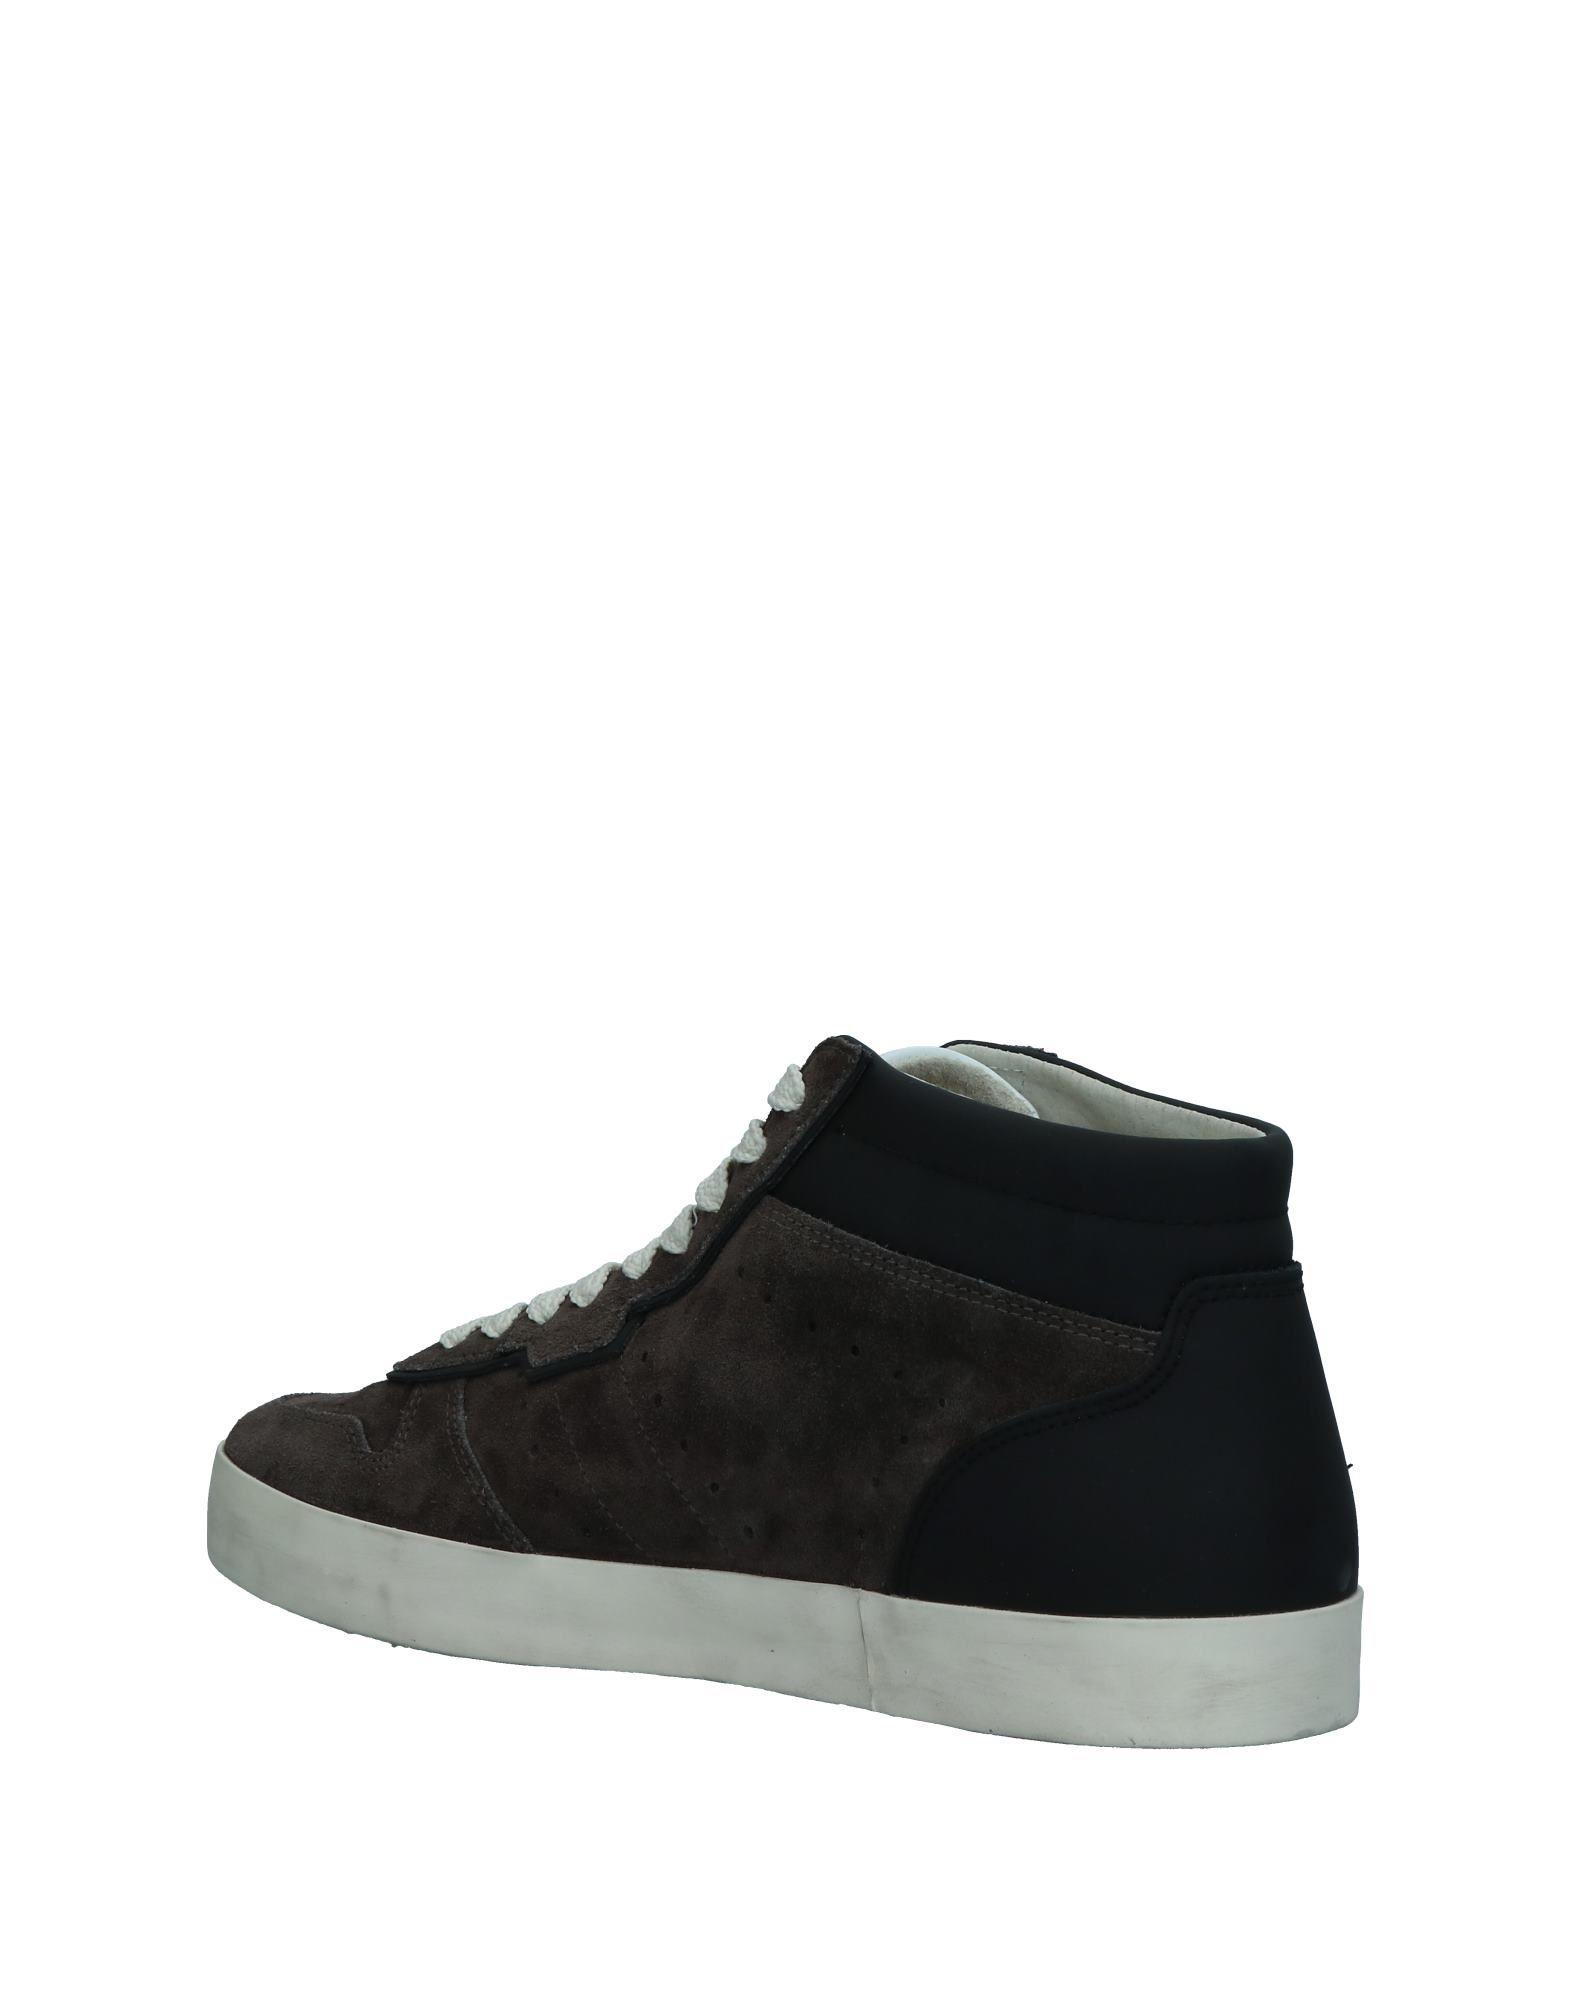 D.A.T.E. Heiße Sneakers Herren  11311143GO Heiße D.A.T.E. Schuhe 7bd52c